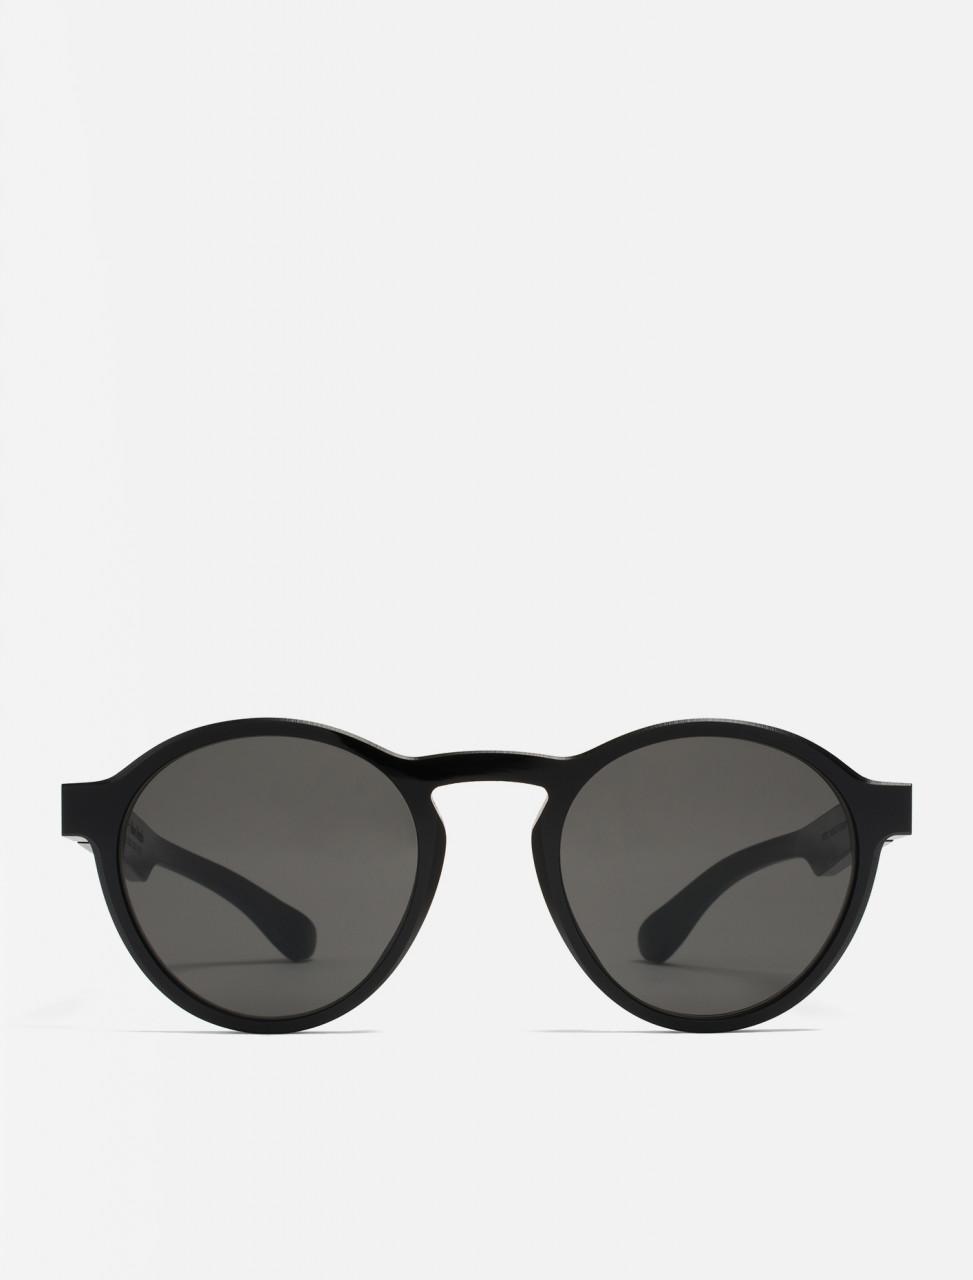 MMRAW002 Sunglasses